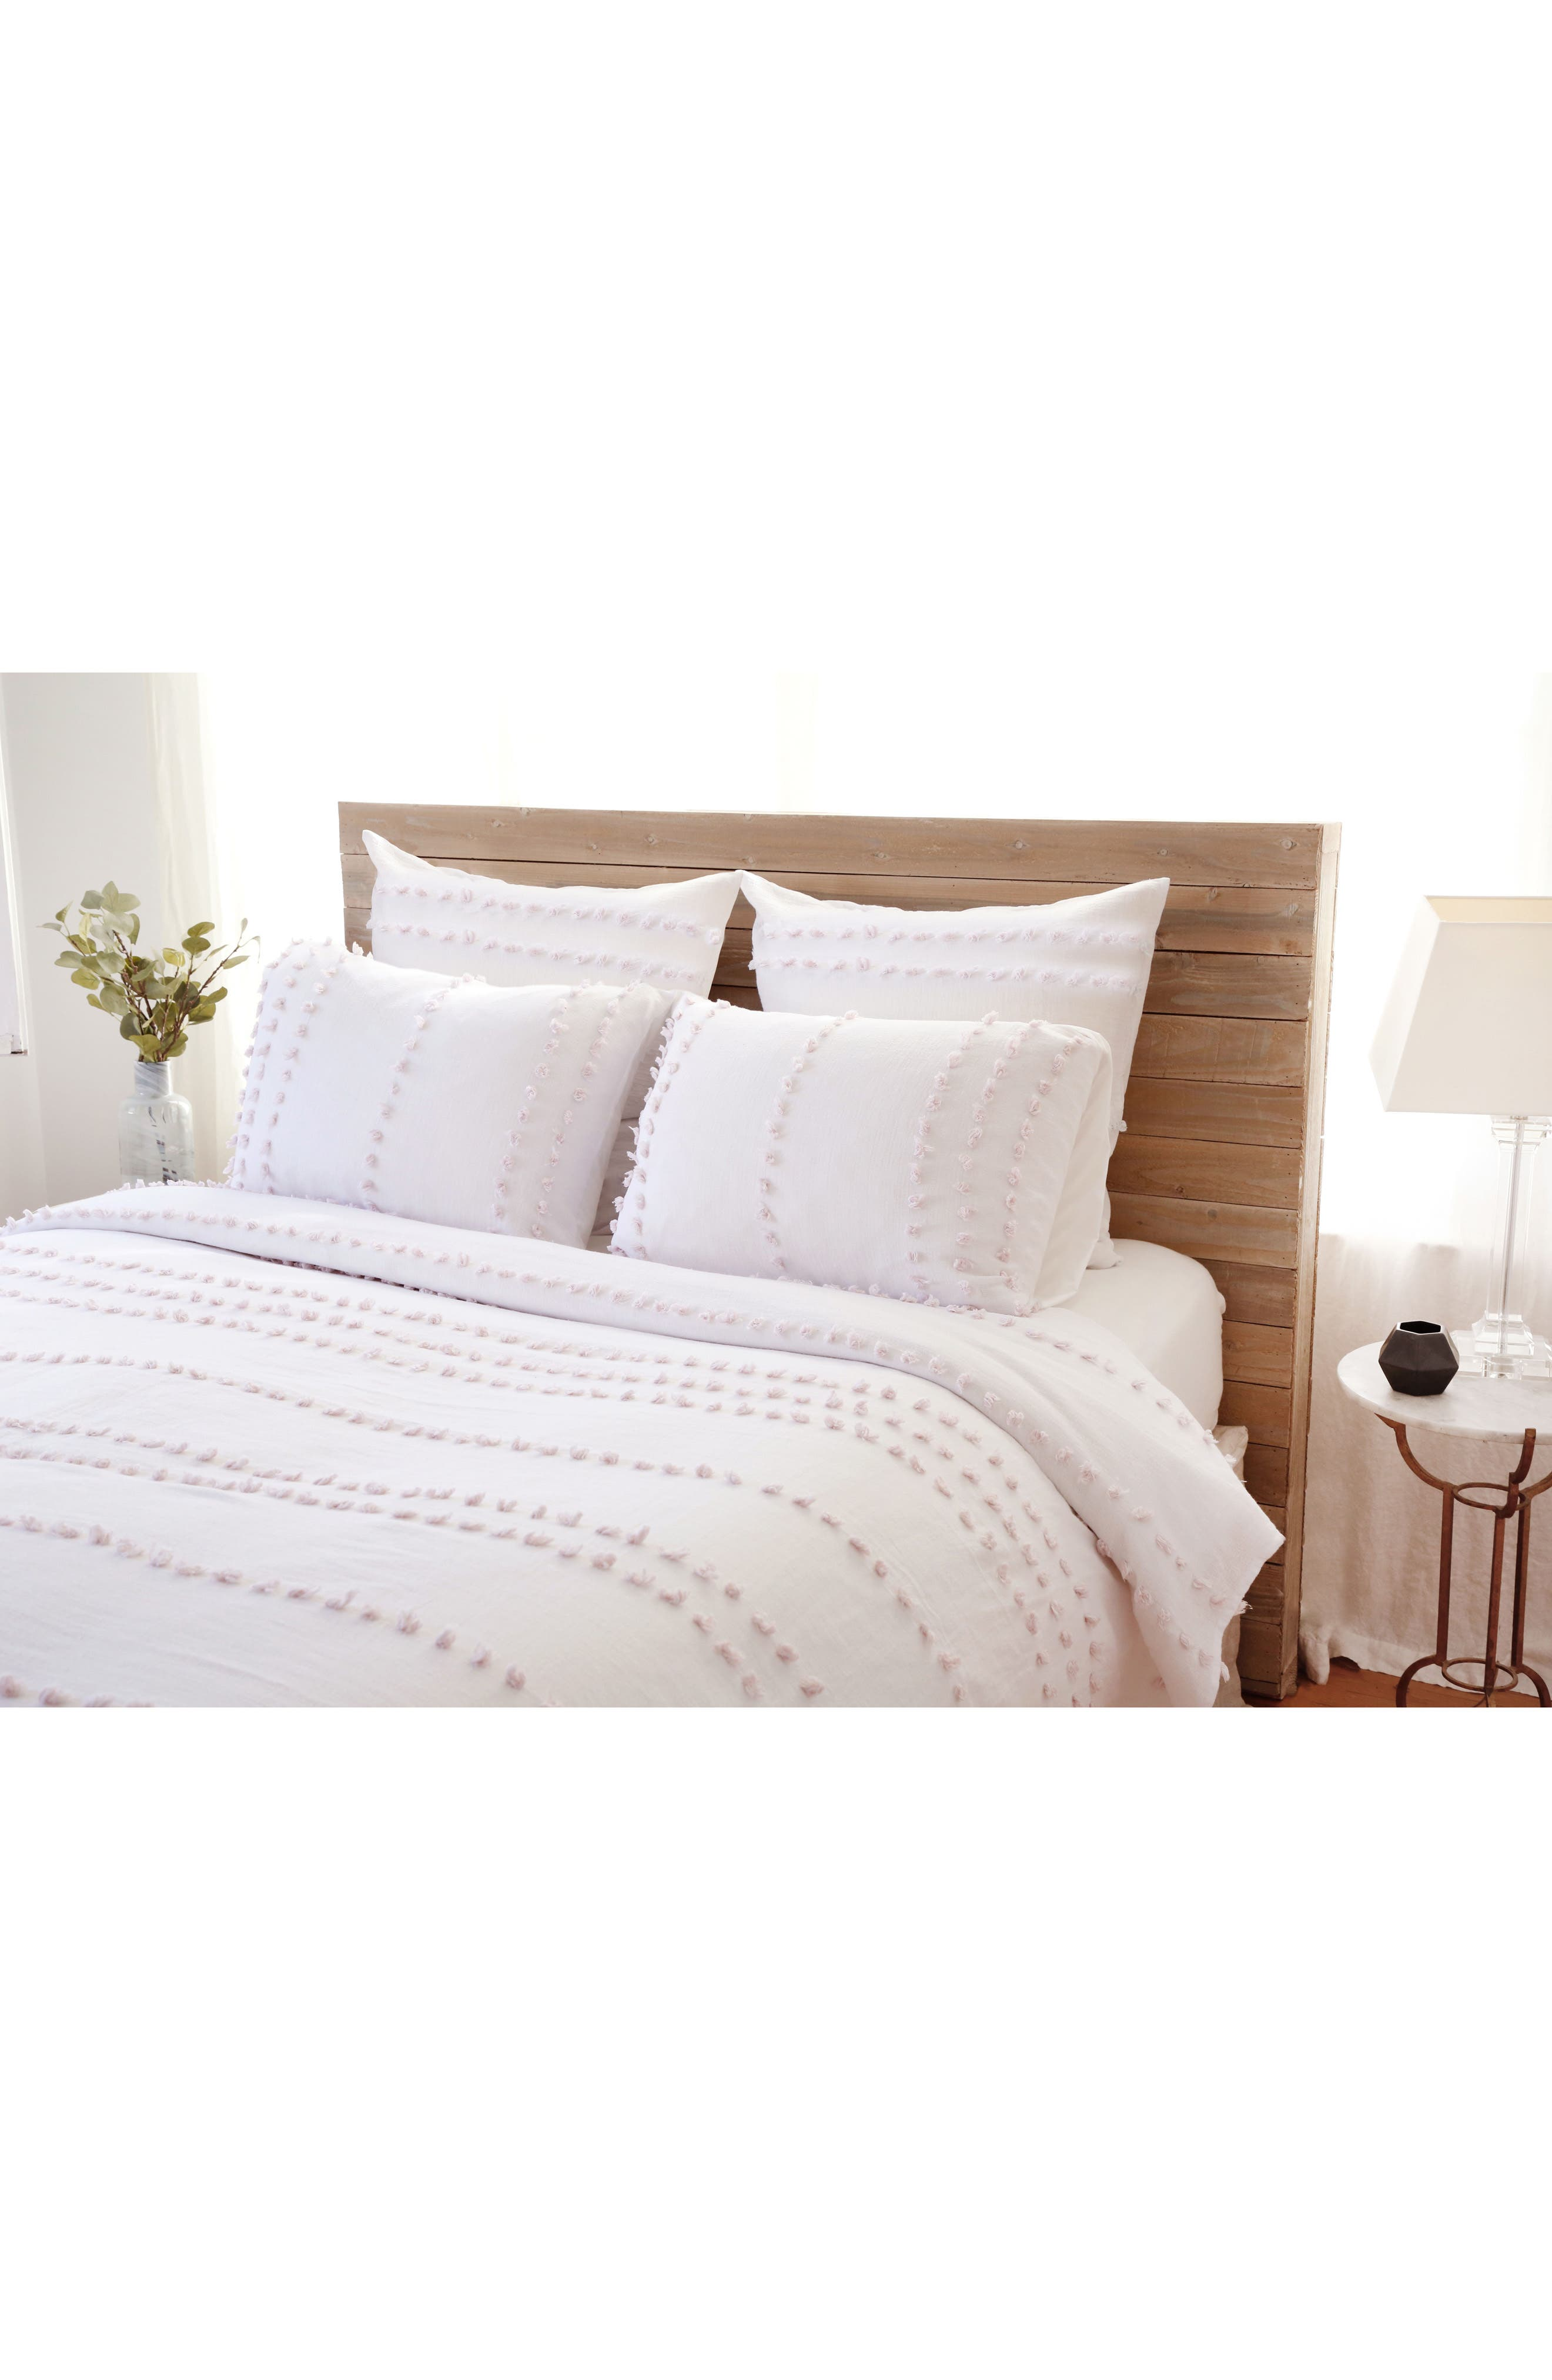 Poppy Blanket & Sham Set,                         Main,                         color, WHITE/ BLUSH